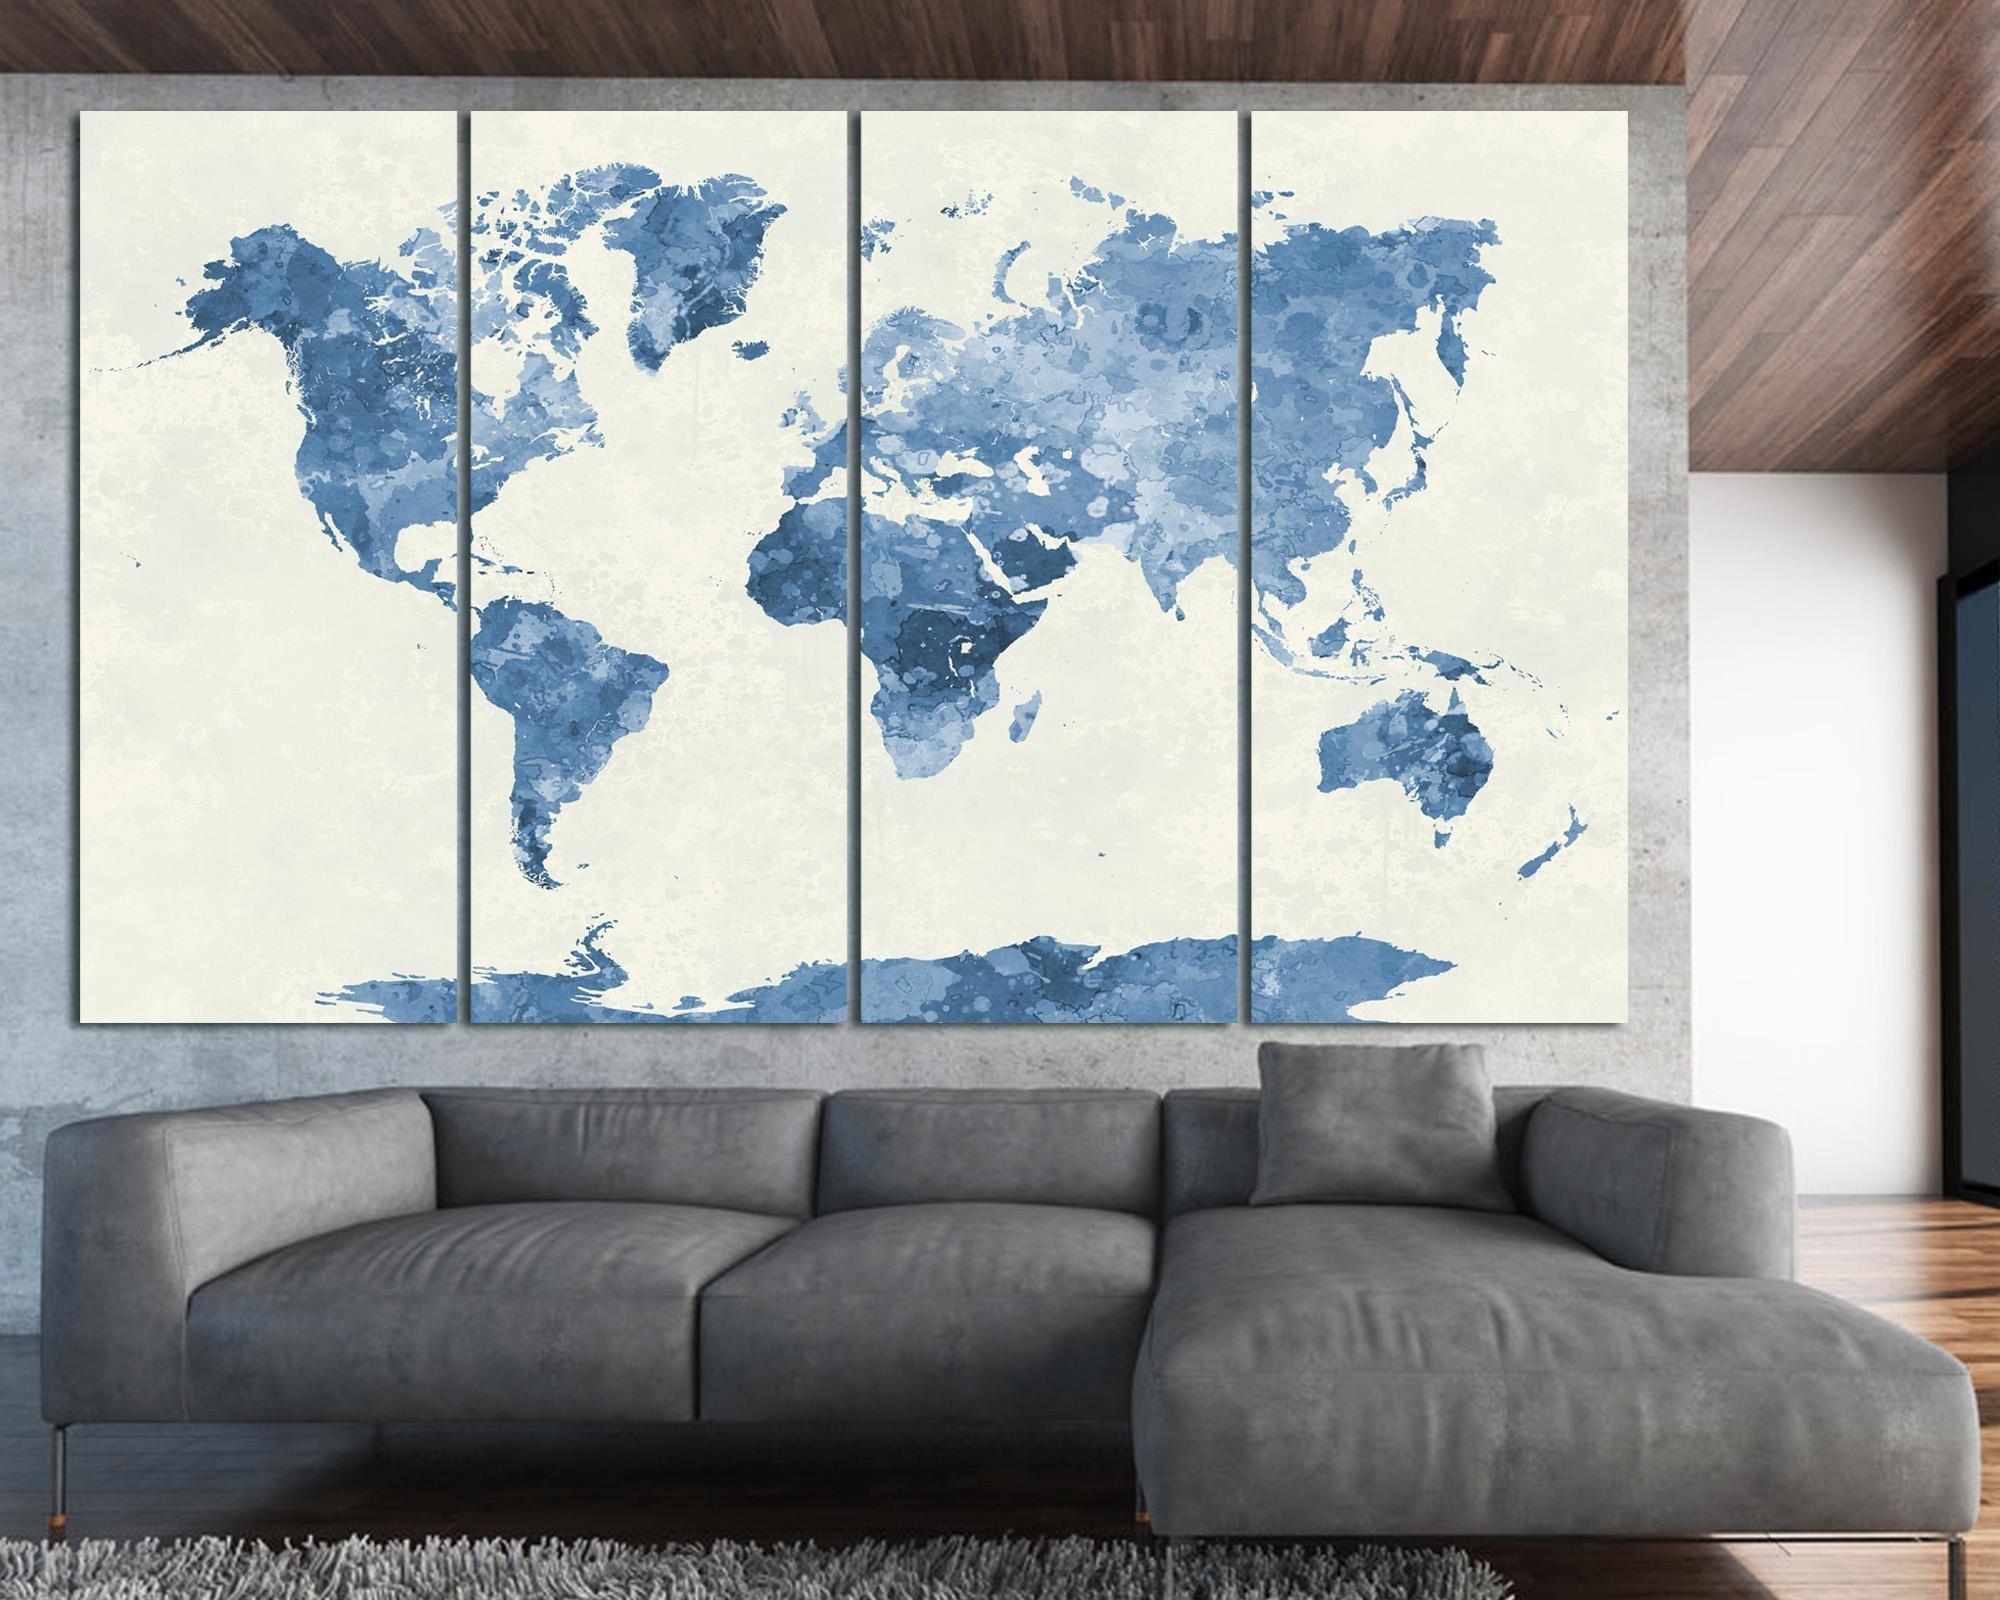 Navy Blue Watercolor World Map Print At Texelprintart For Navy Blue Wall Art (Image 18 of 20)